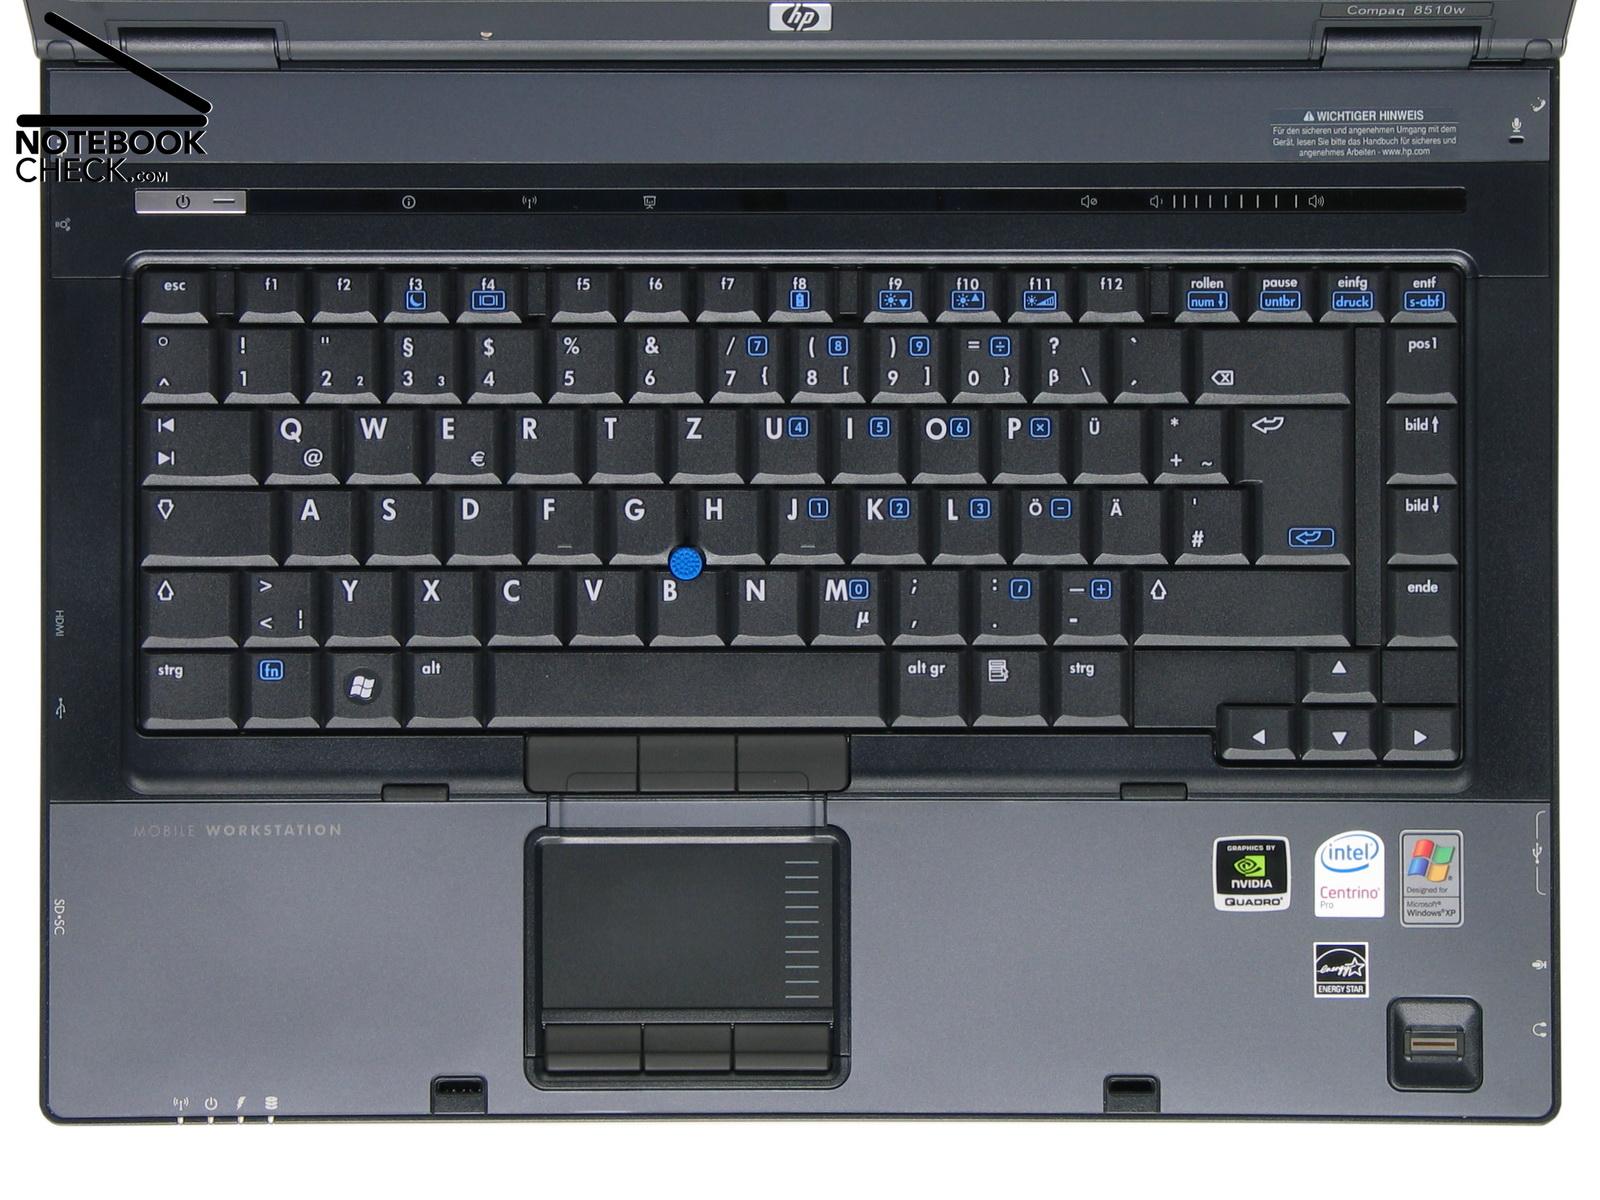 COMPAQ 8510W ETHERNET 64BIT DRIVER